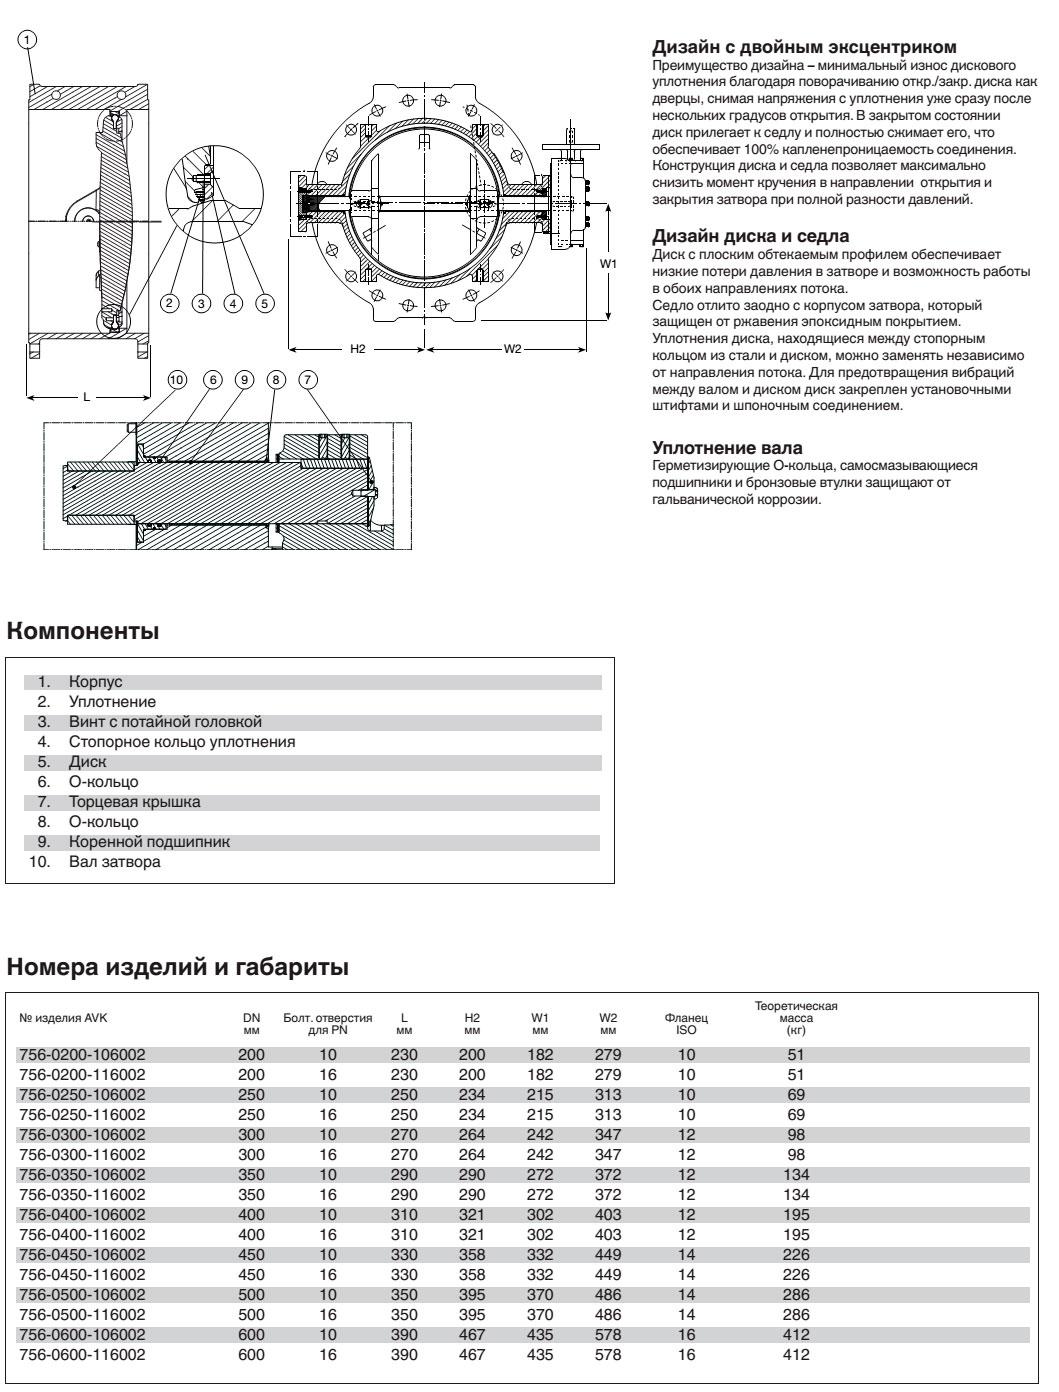 AVK затвор дисковый поворотный, PN 10/16